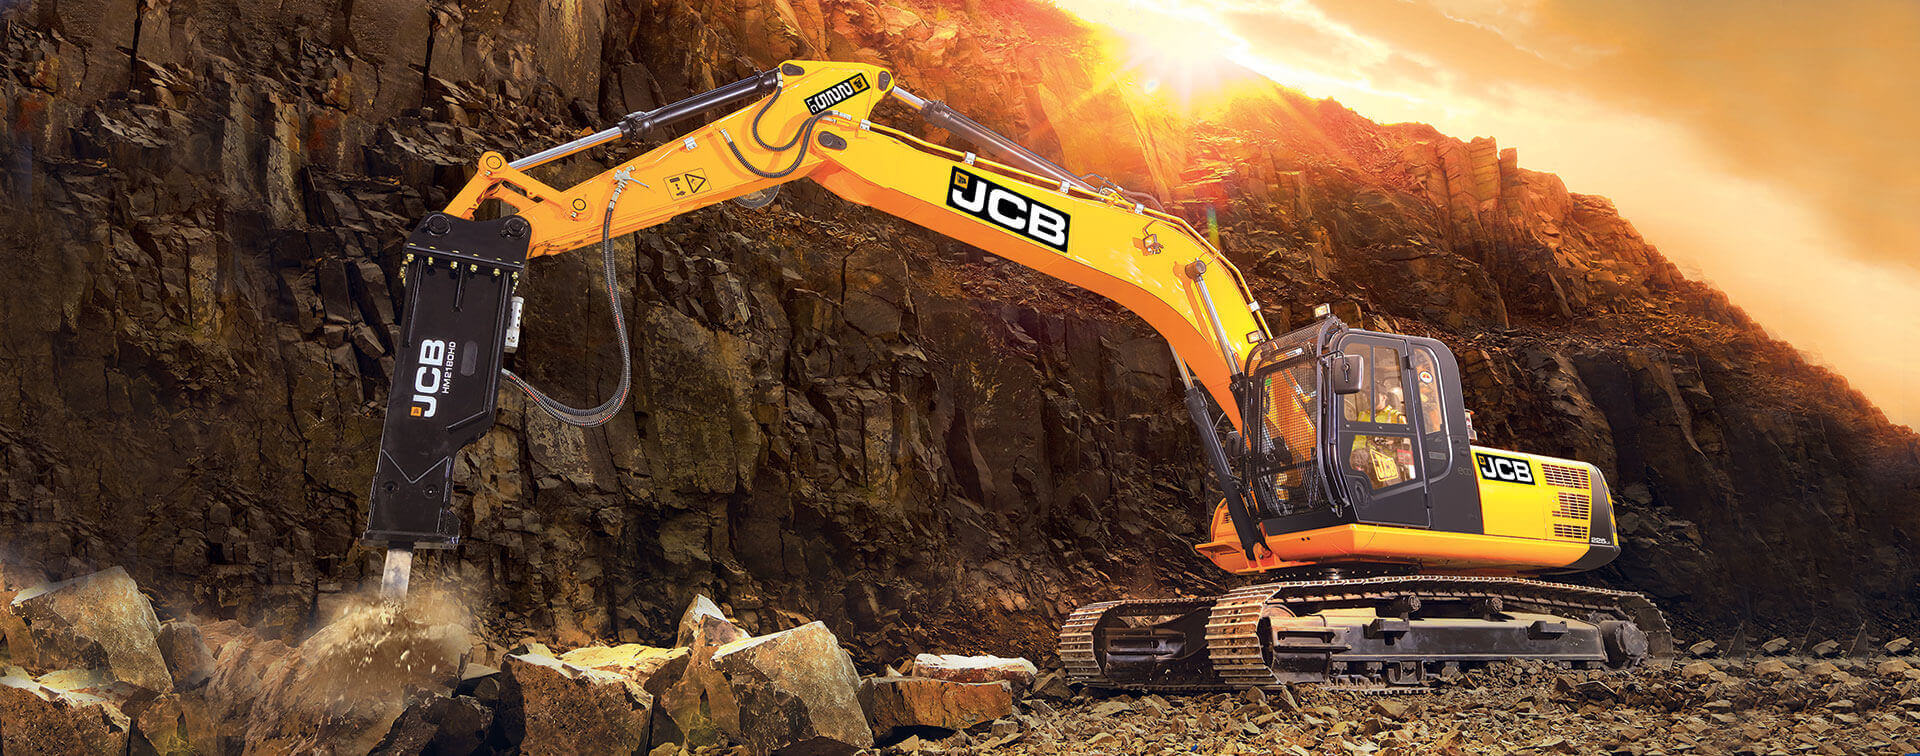 JCB Excavator Commercial Vehicle